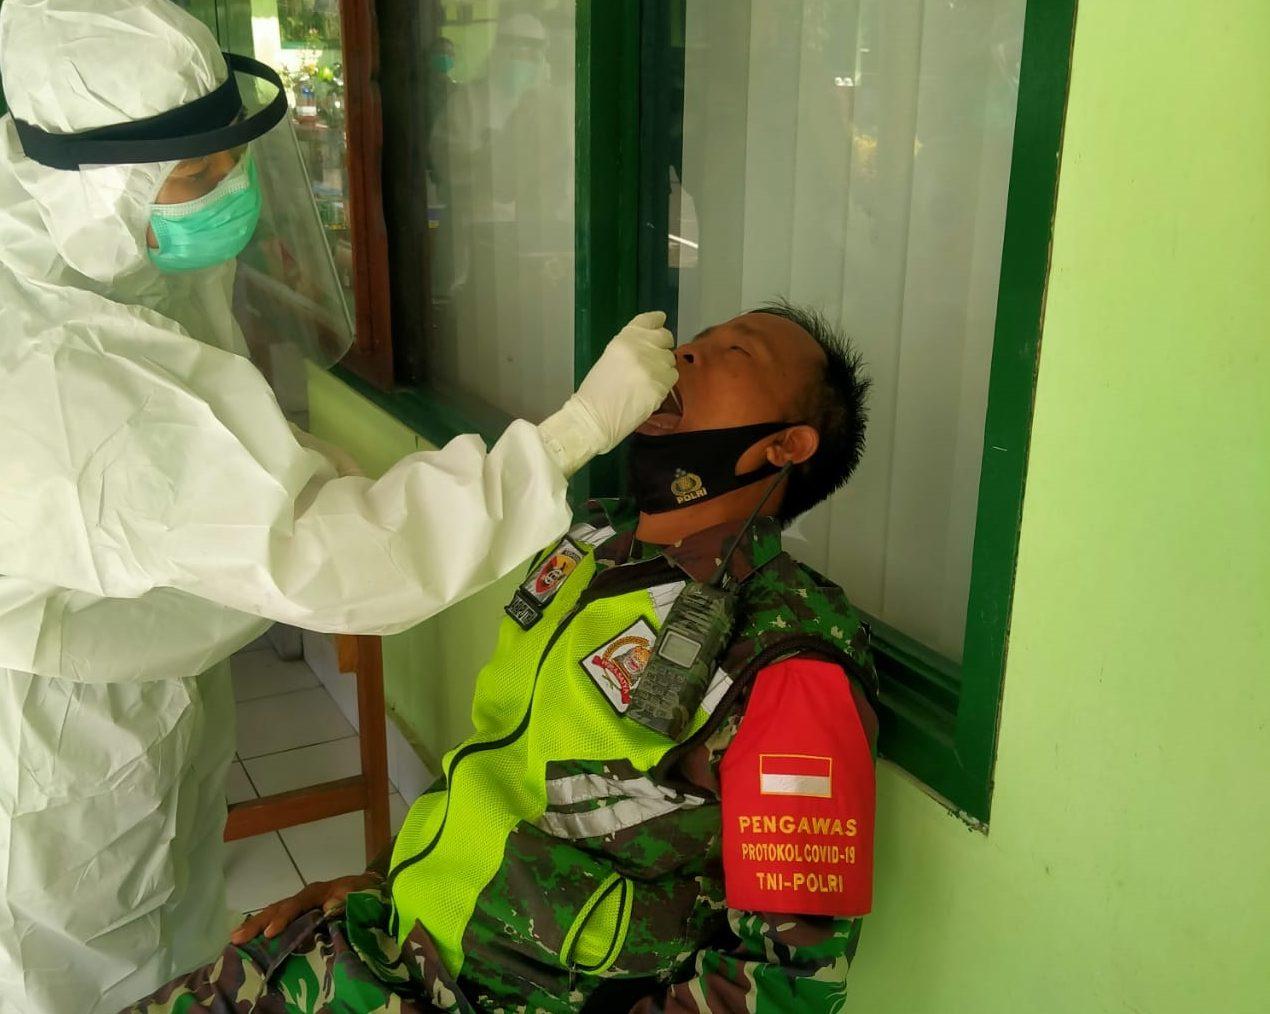 63 babinsa Kodim 1610/Klungkung menjalani tes usap di aula Kodim, Senin (2/11/2020). Foto: ist